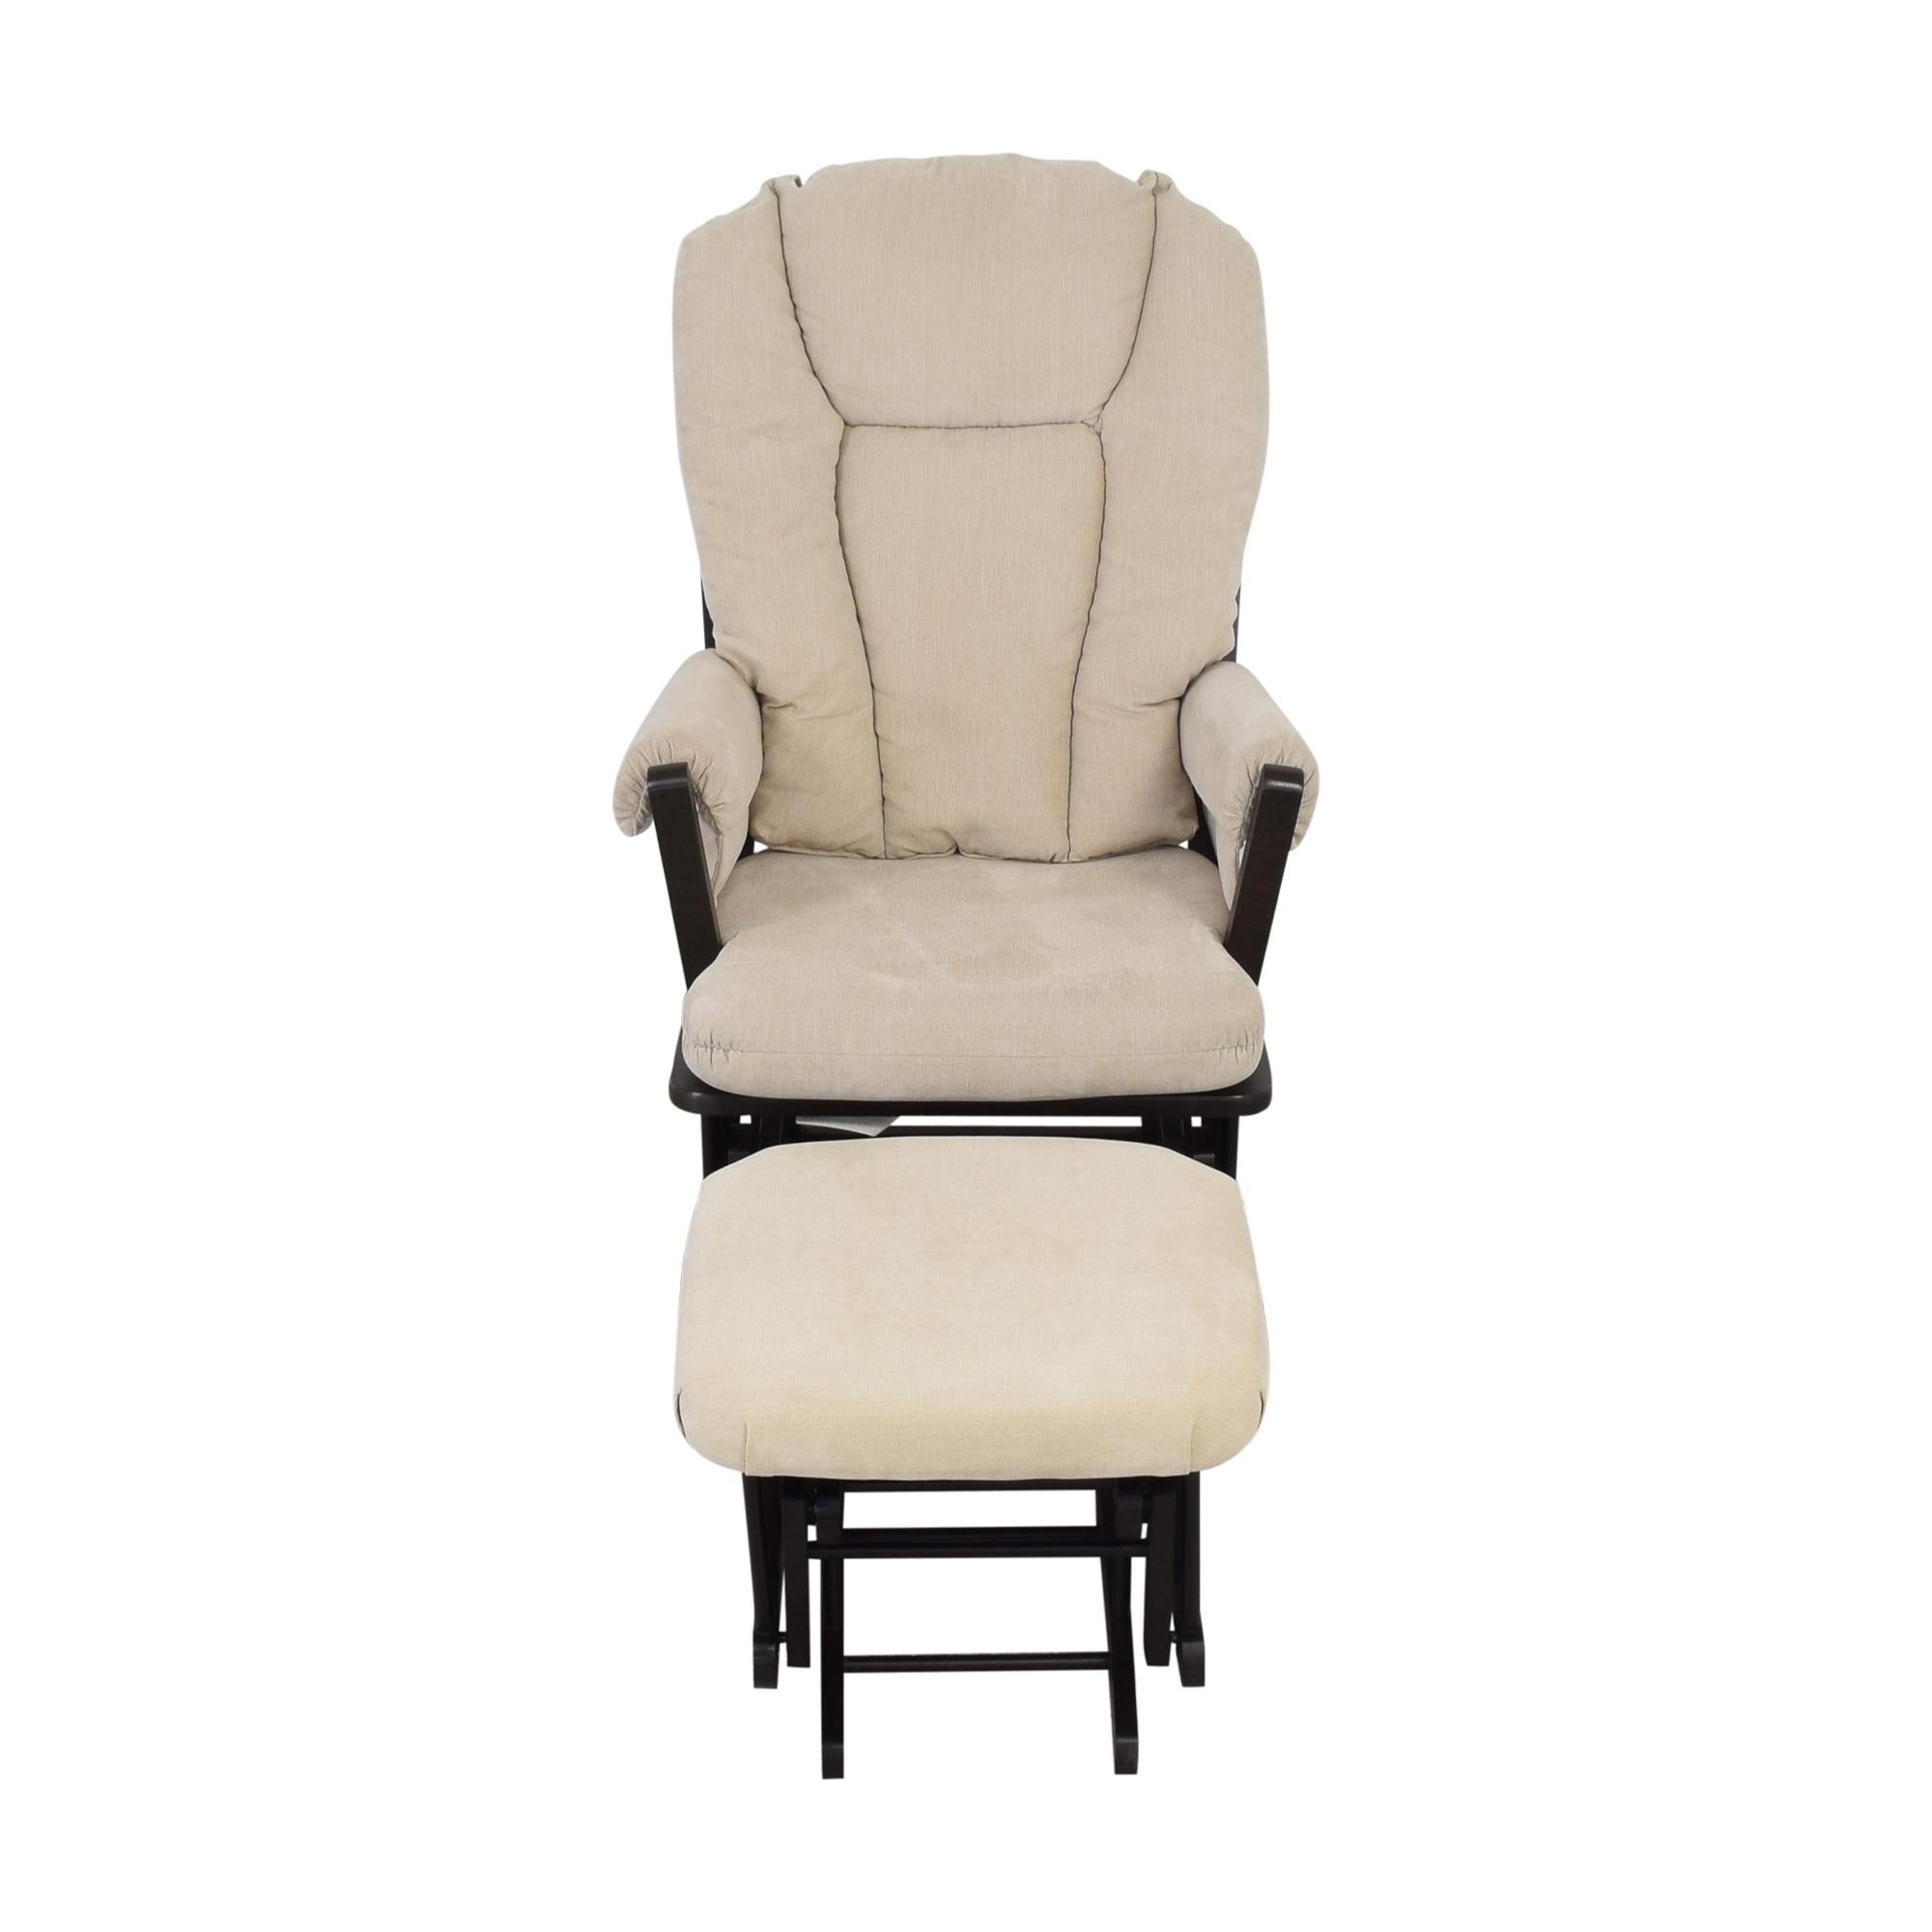 Dutailier Dutalier Rocking Chair and Ottoman discount